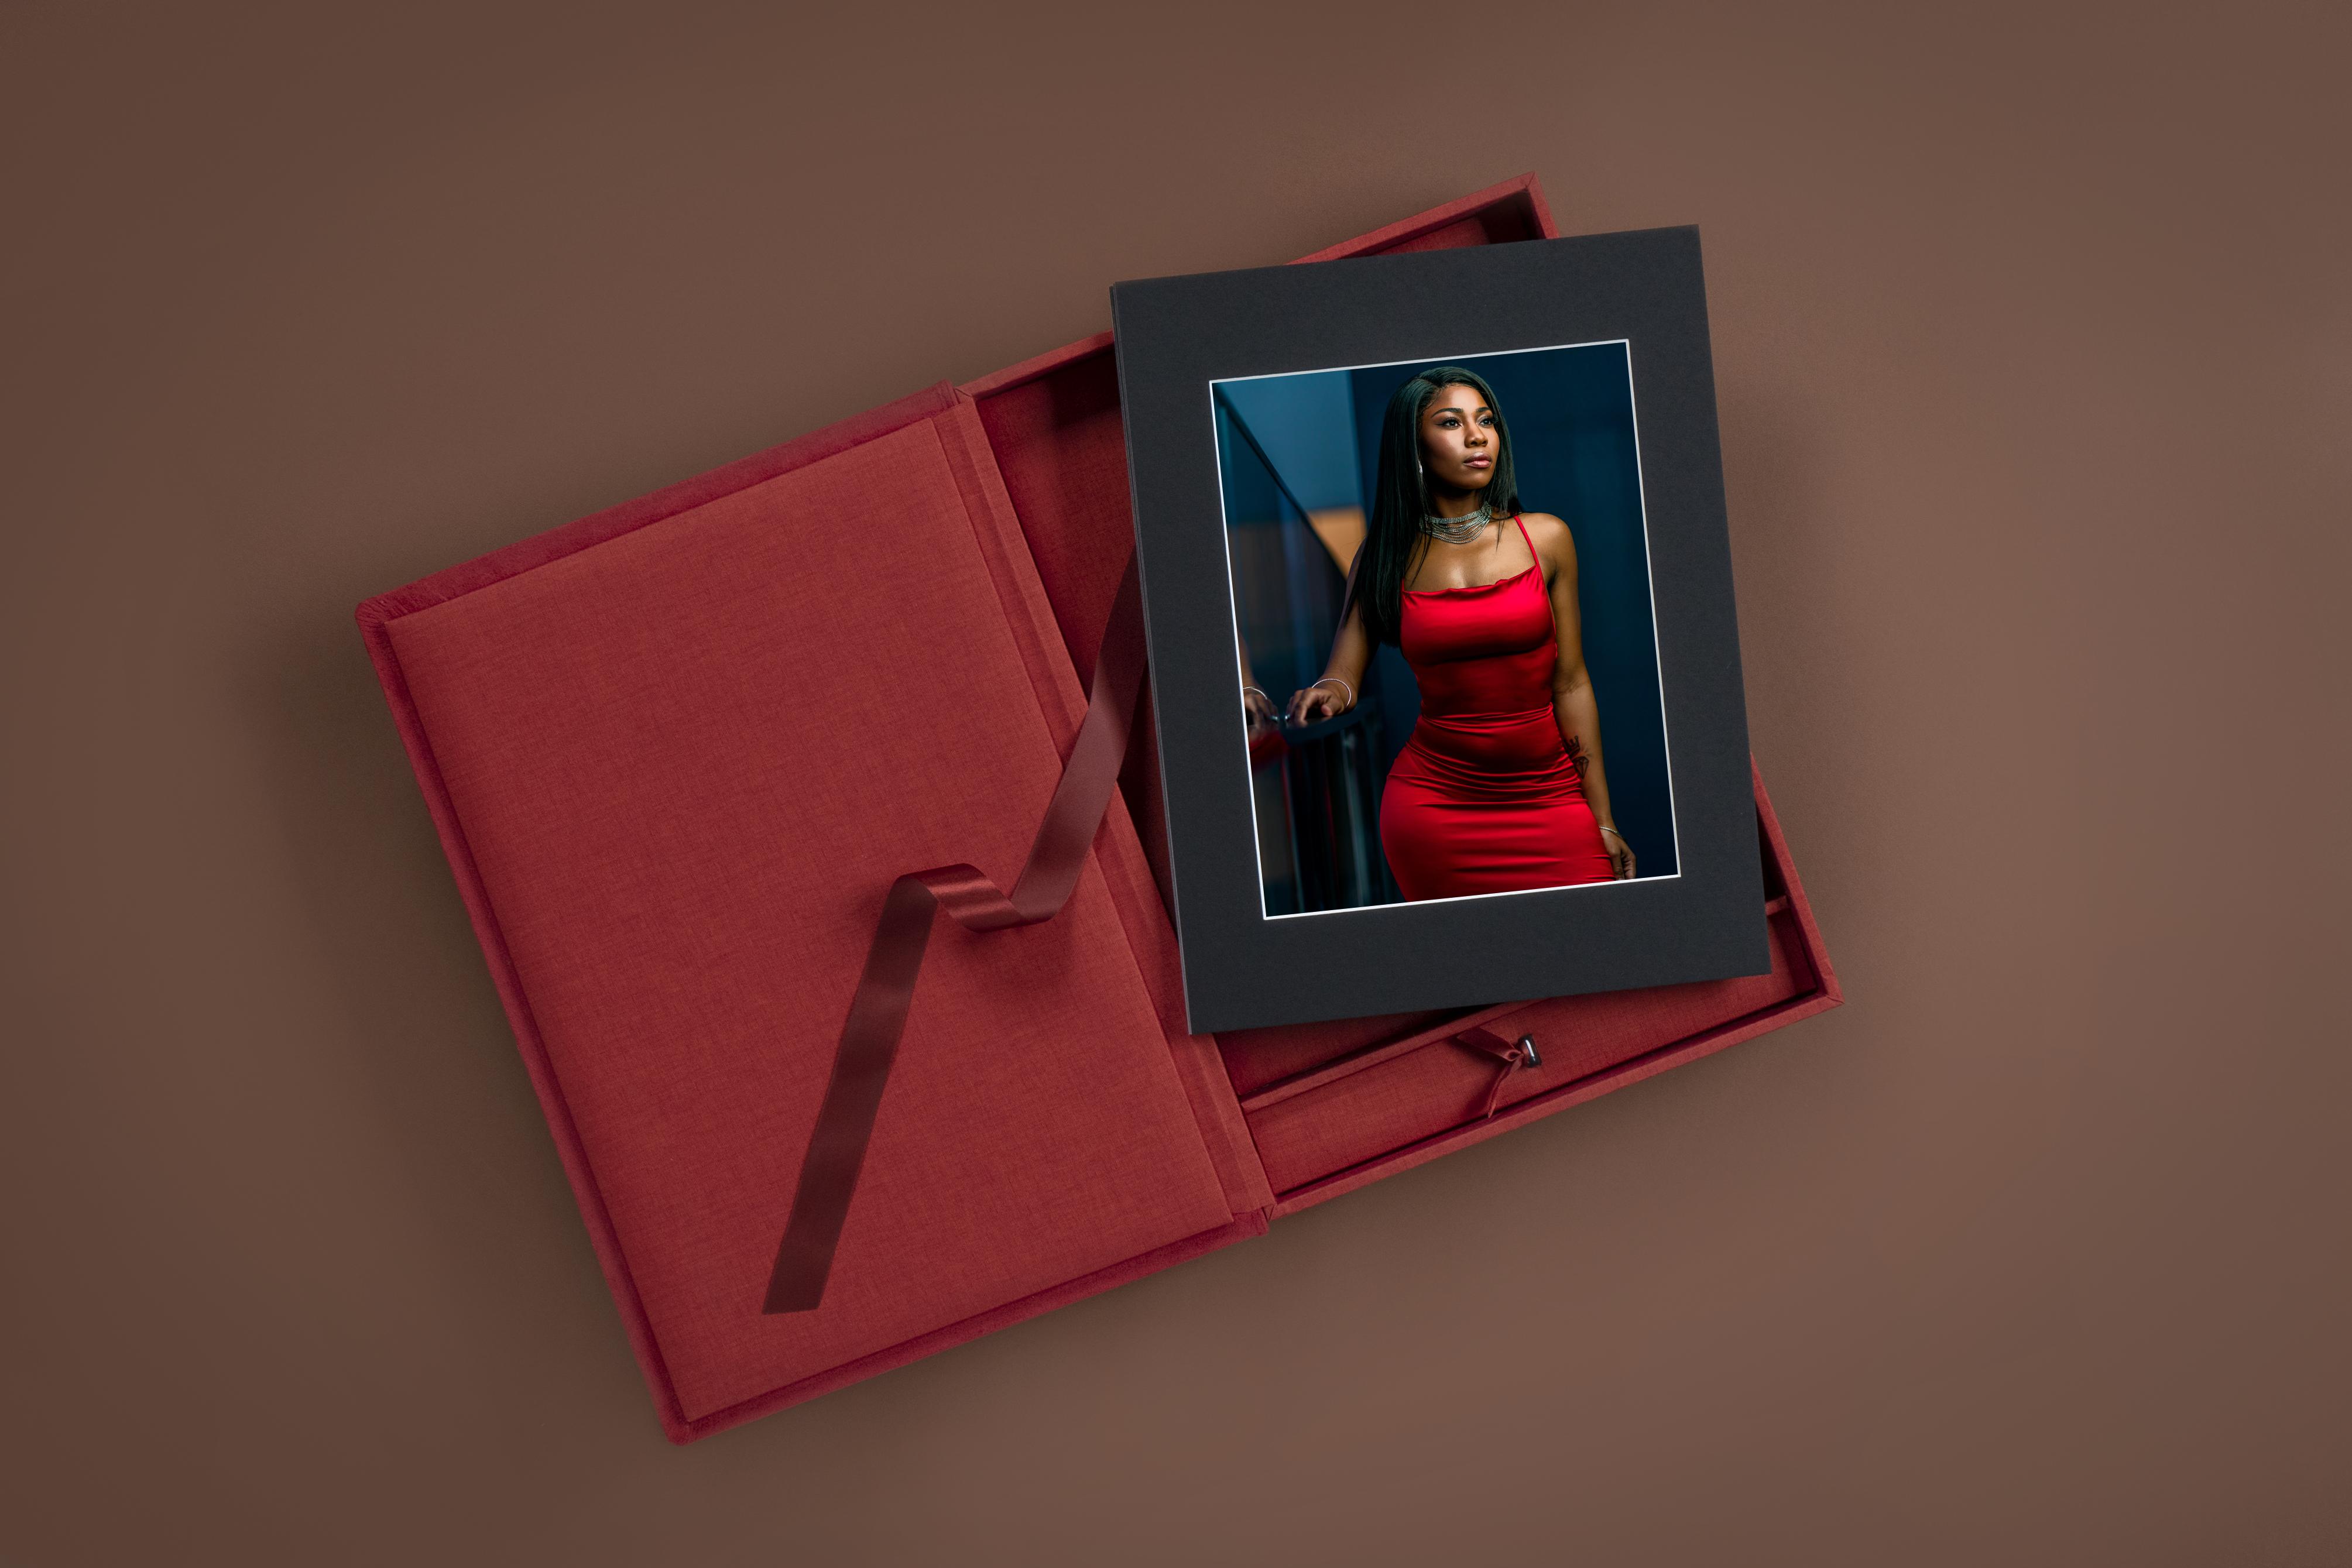 Folio Box with Mini USB - Professional Print by nPhoto - Artwork by Jermaine Horton-1